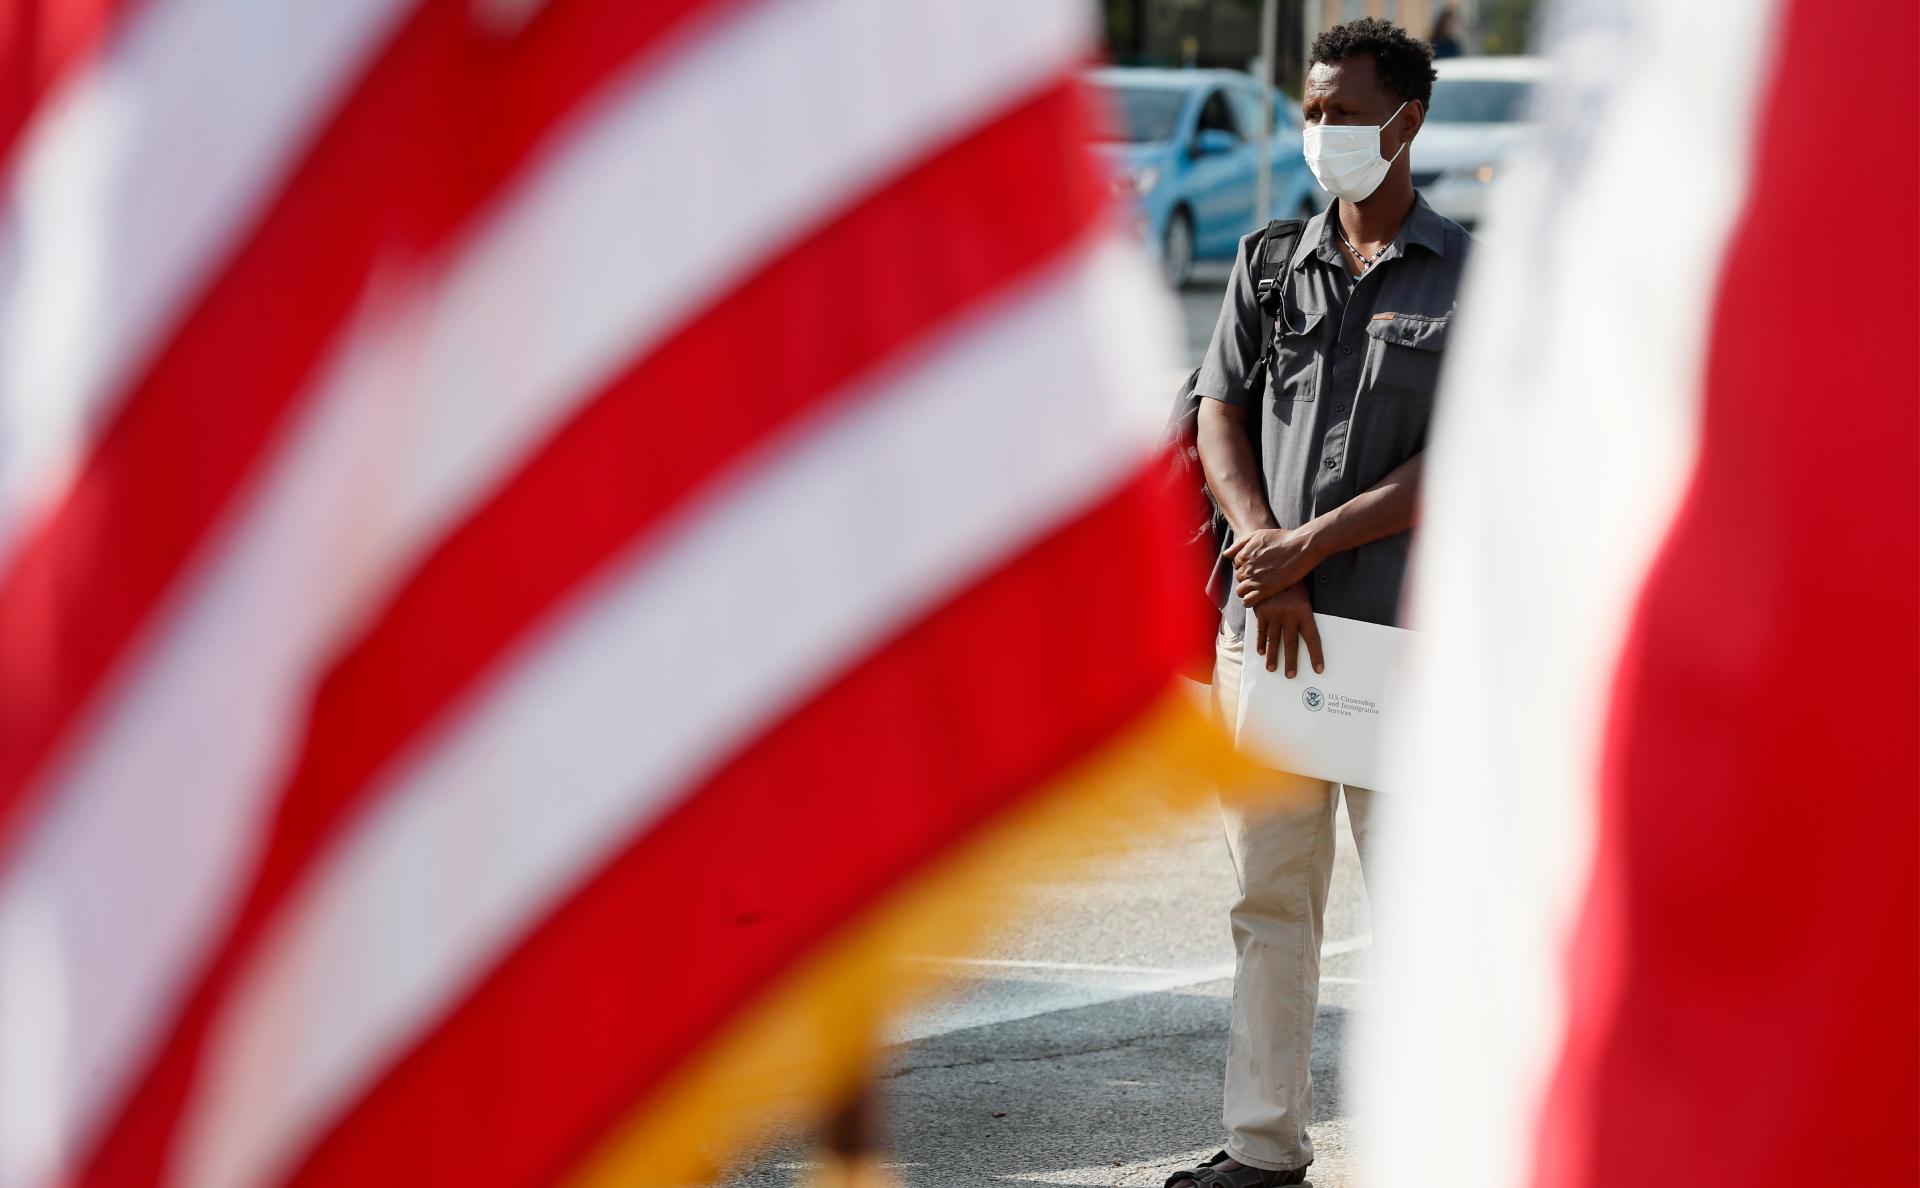 Фото: Charlie Neibergall / AP